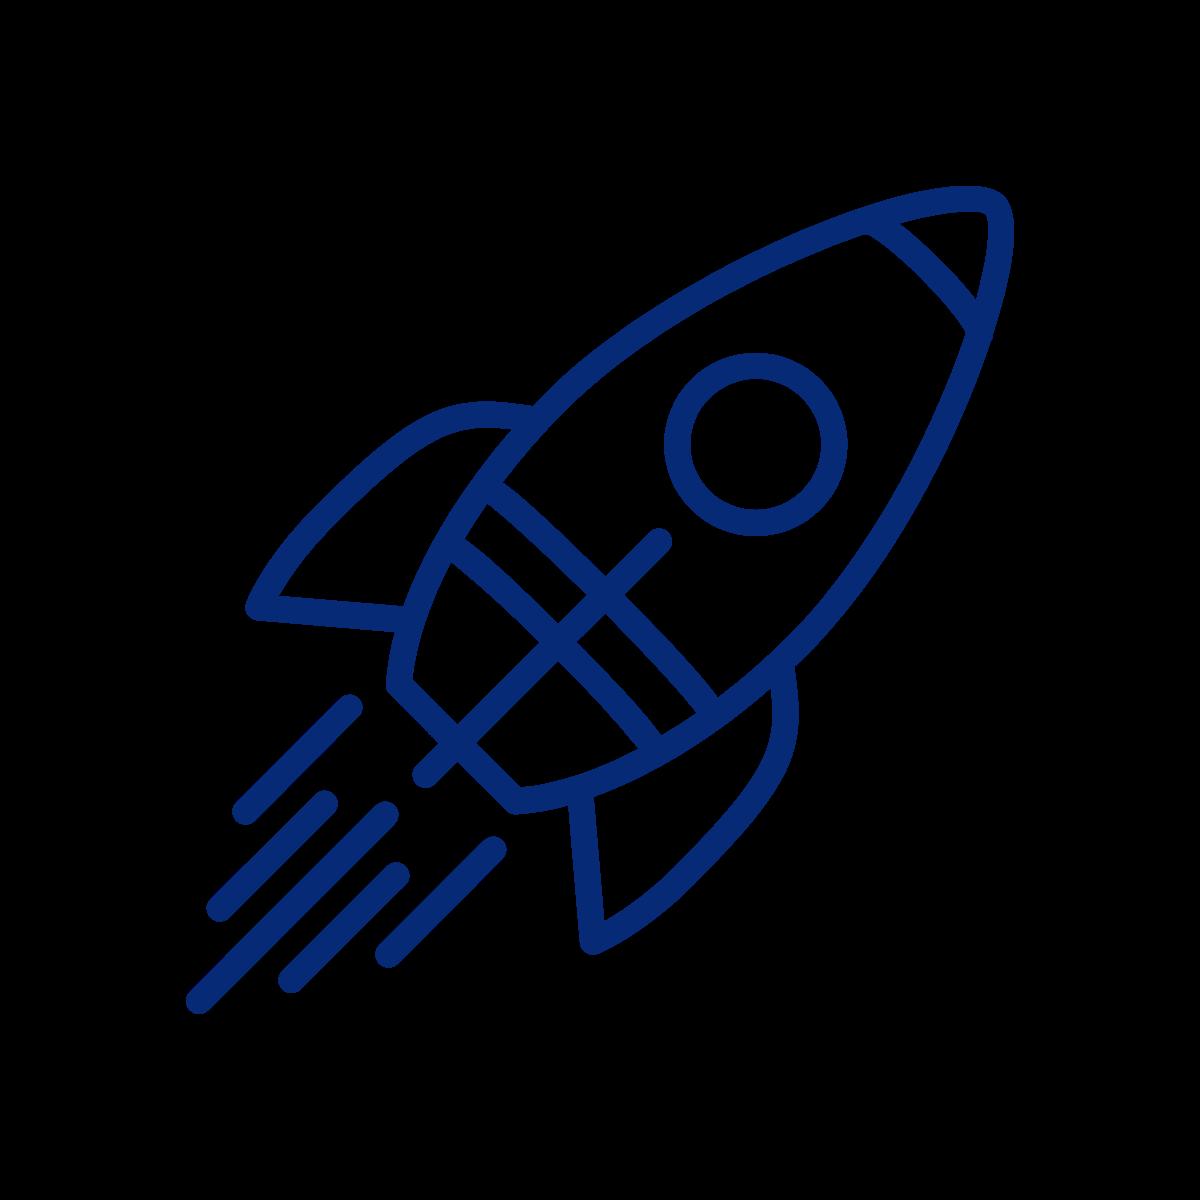 noun_Rocket_1628796.png